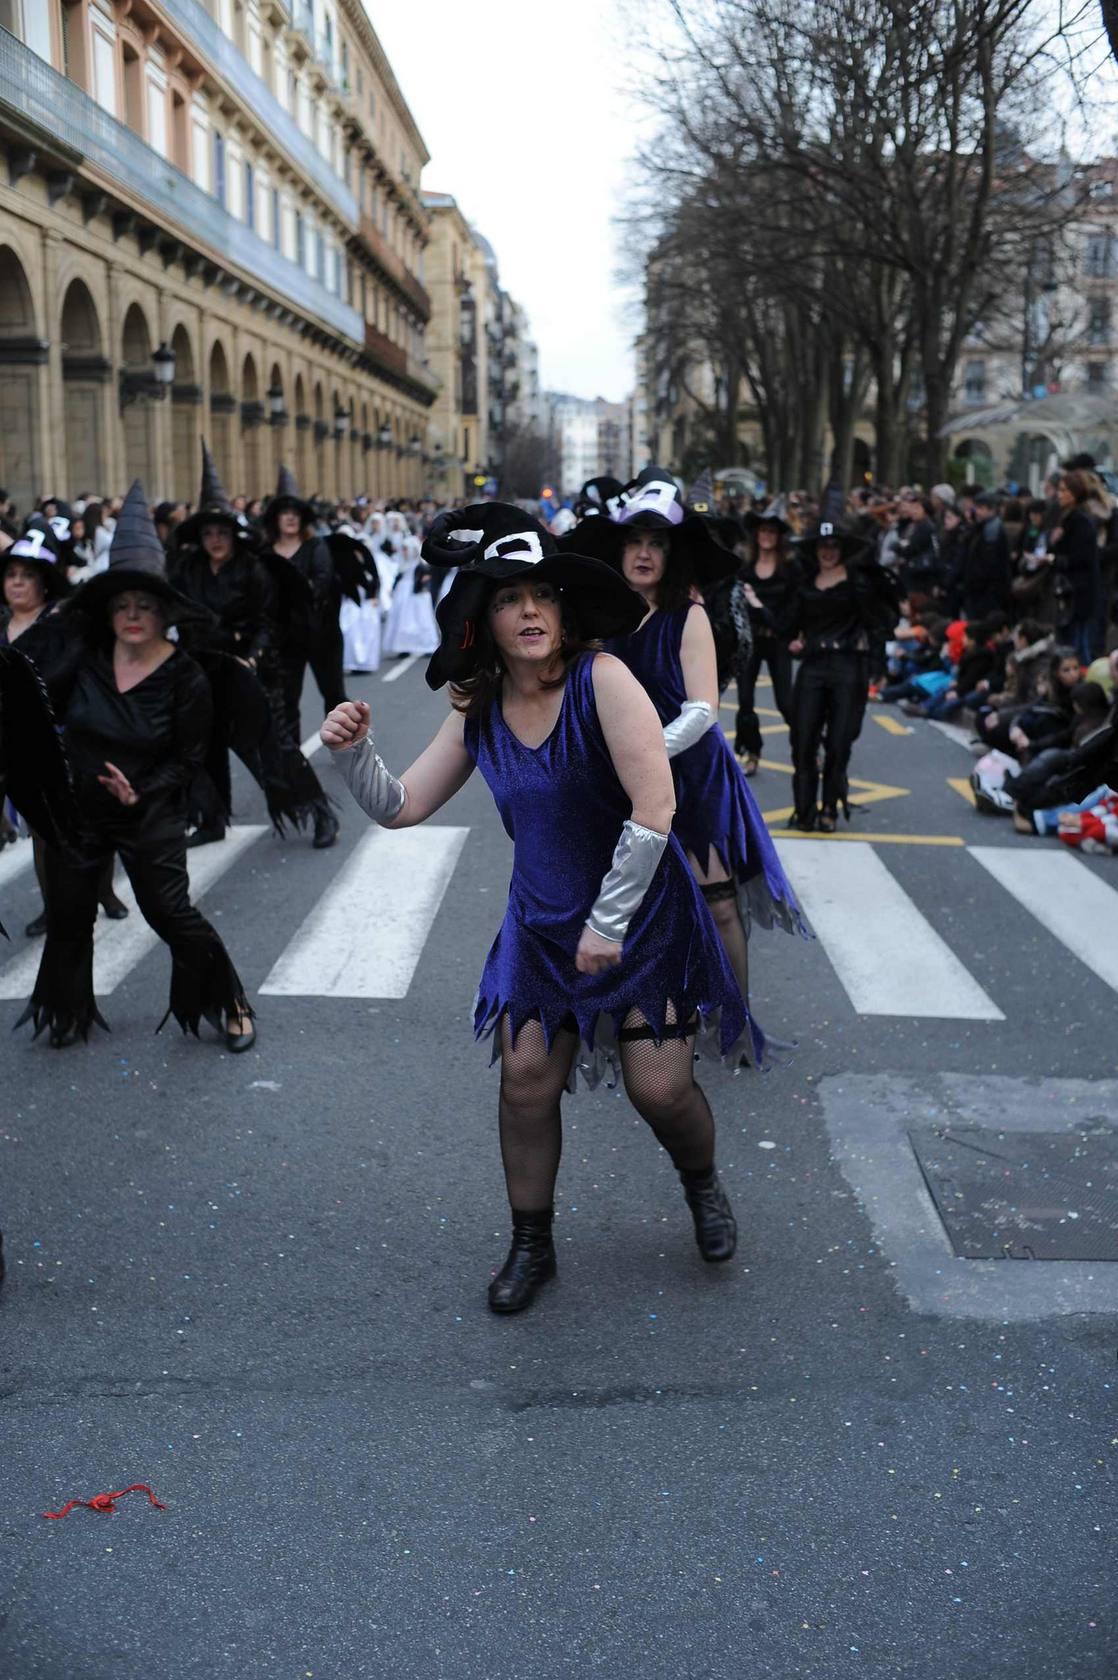 Desfile de carnaval en Donostia